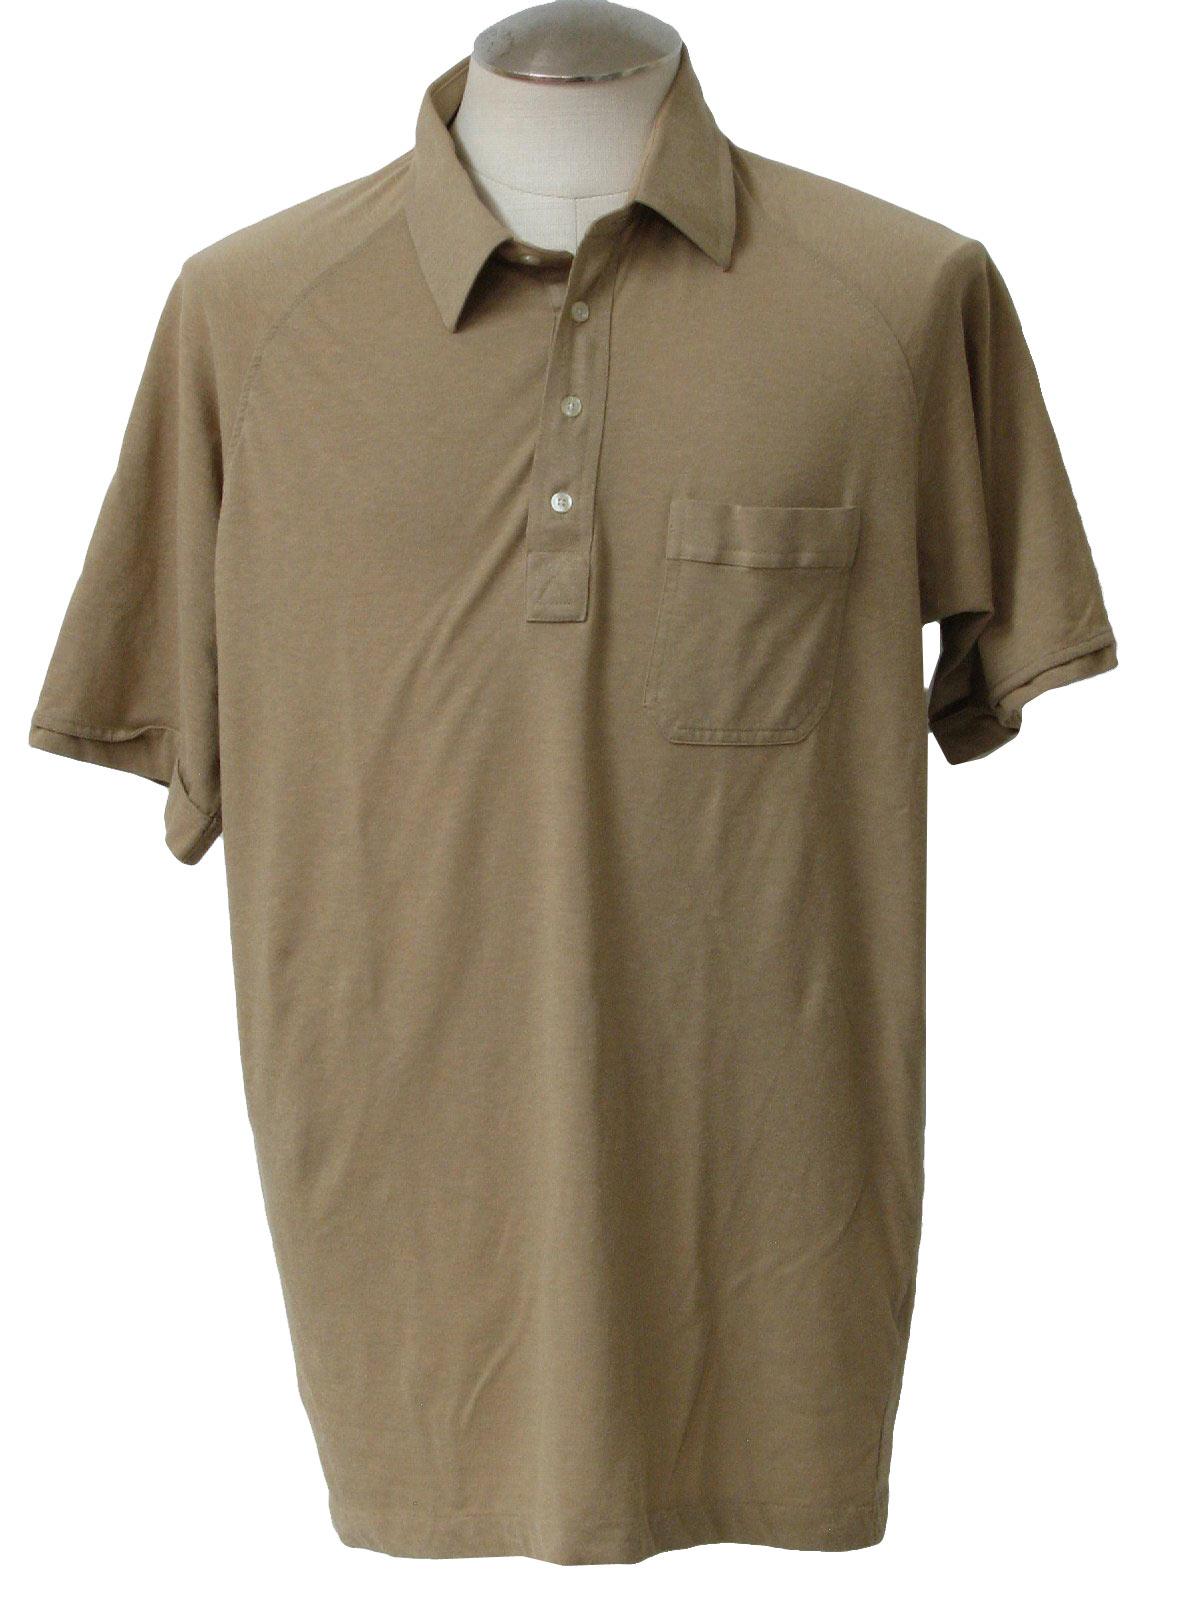 1990 39 S Shirt Arrow 90s Arrow Mens Tan Polyester And